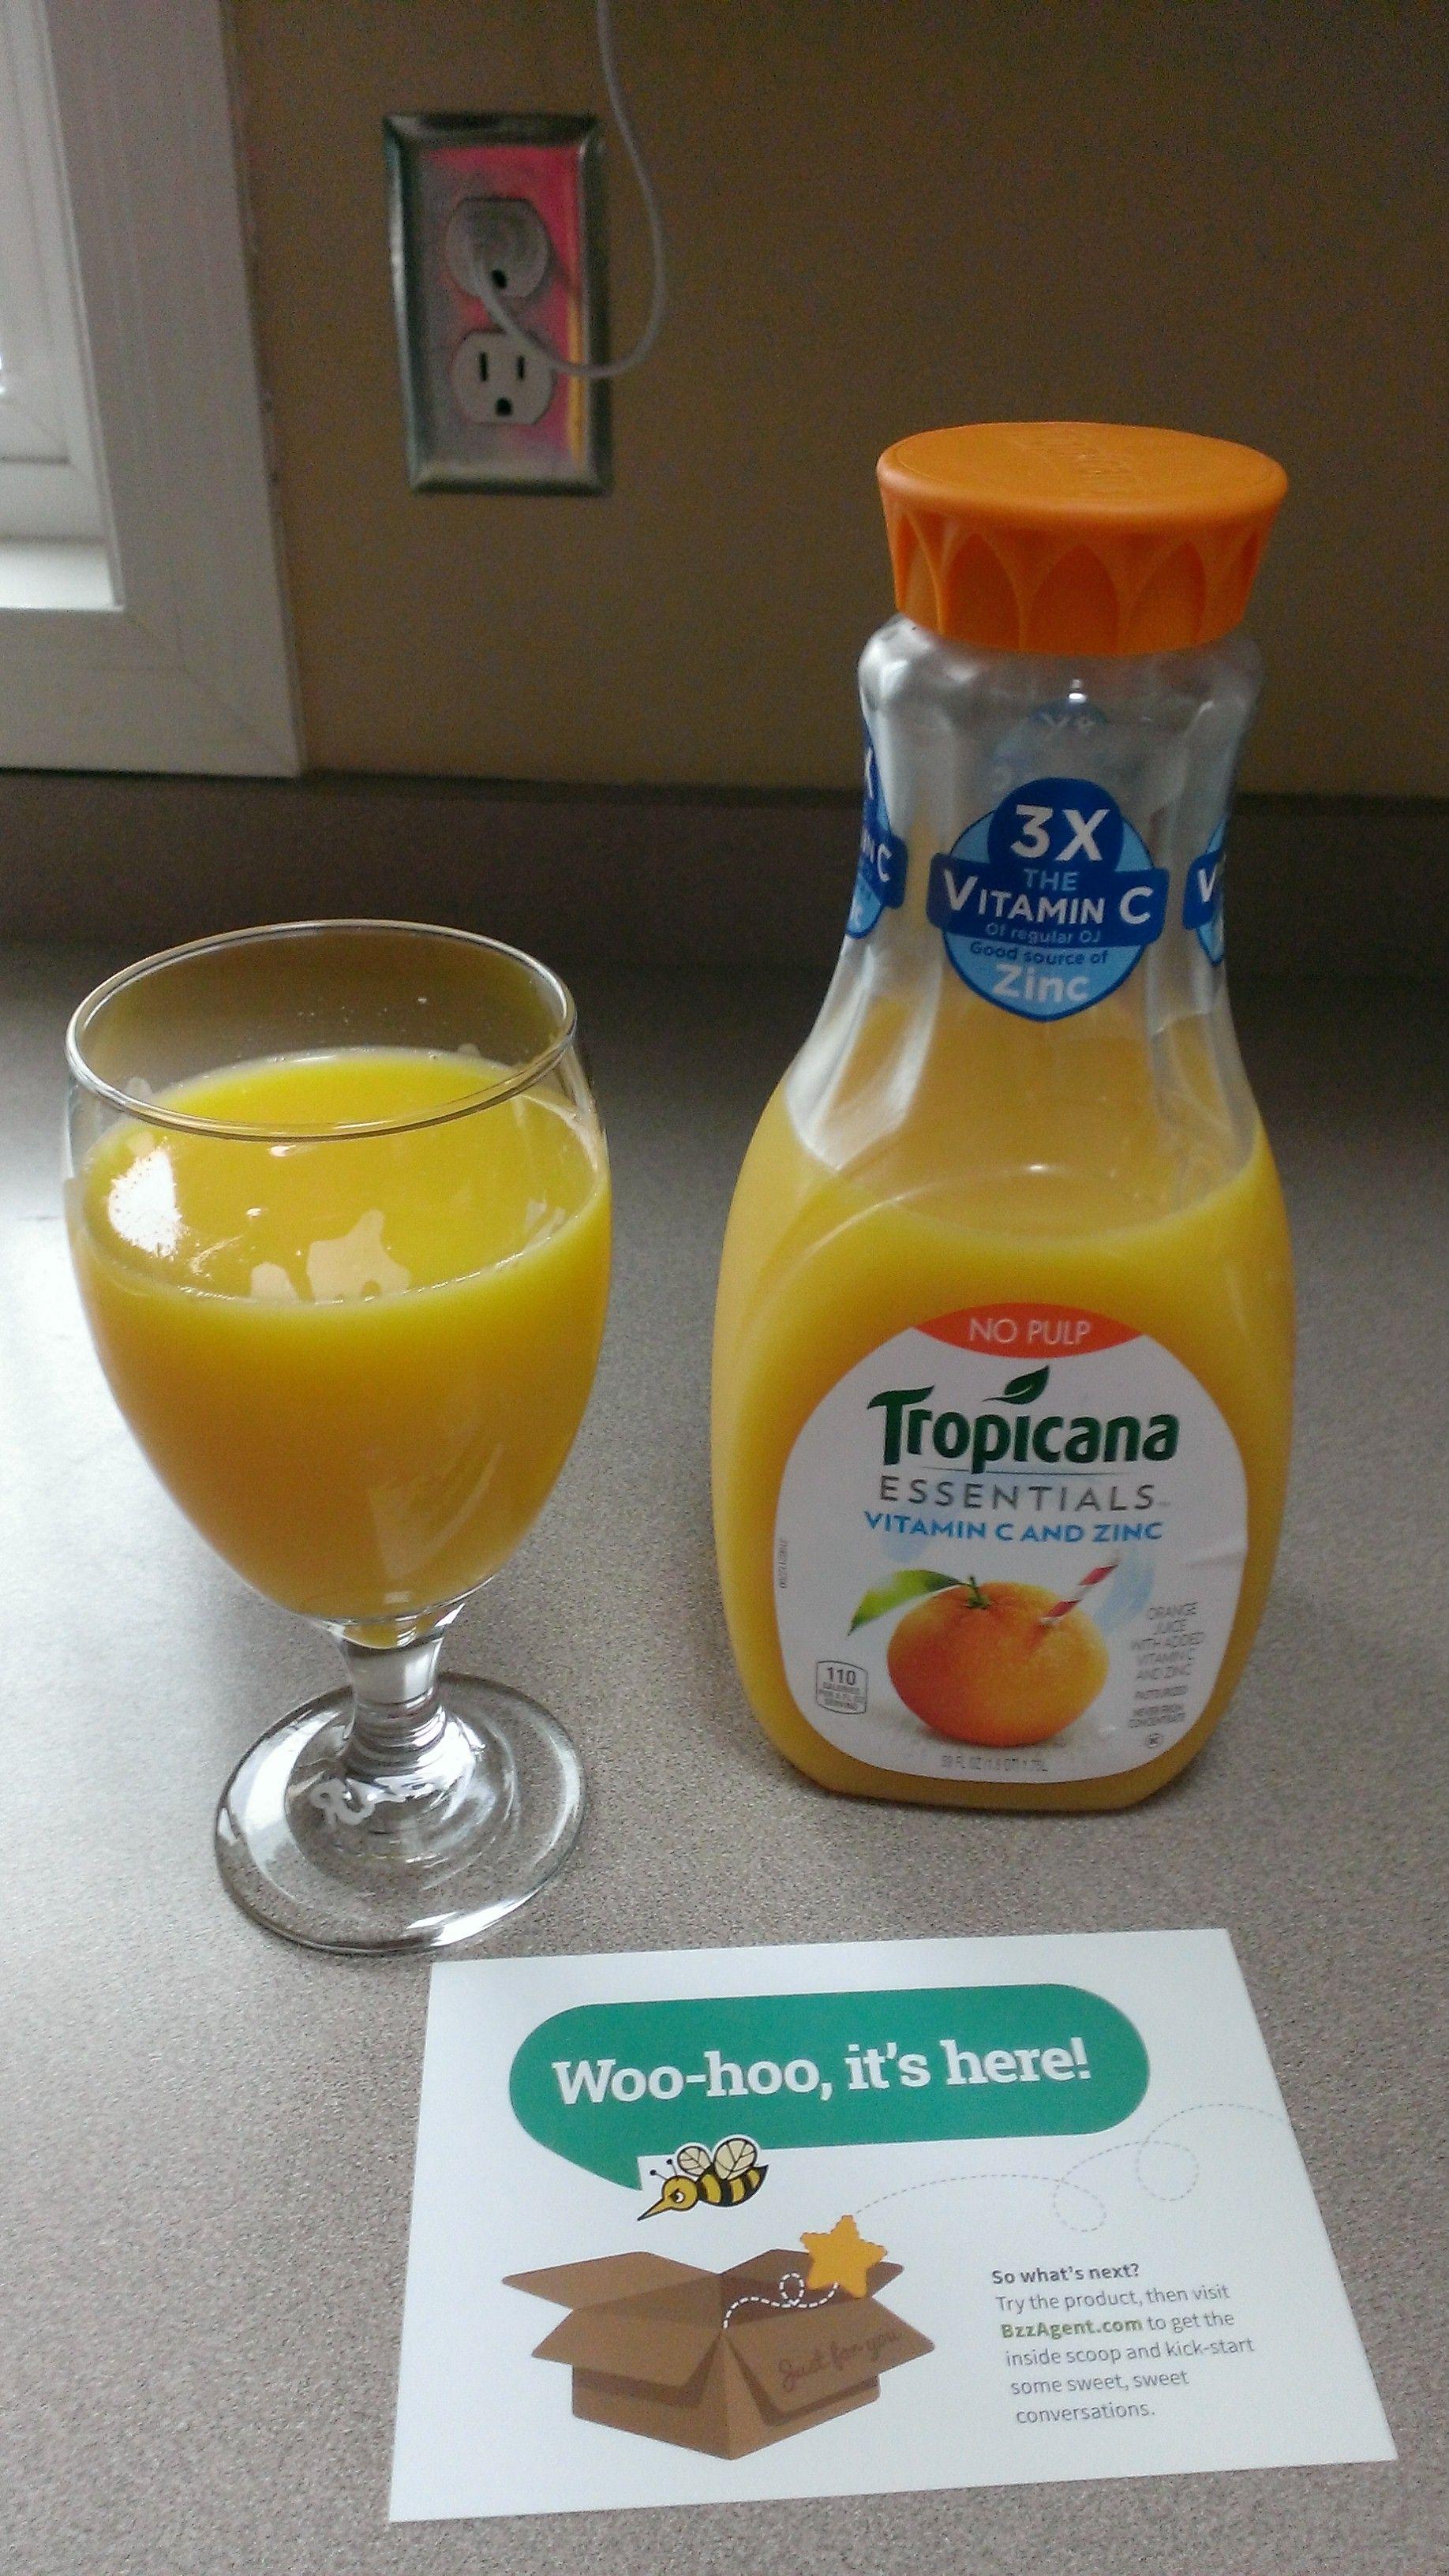 Tropicana Vitamin C & Zinc. GotItFree VitaminCTimesThree